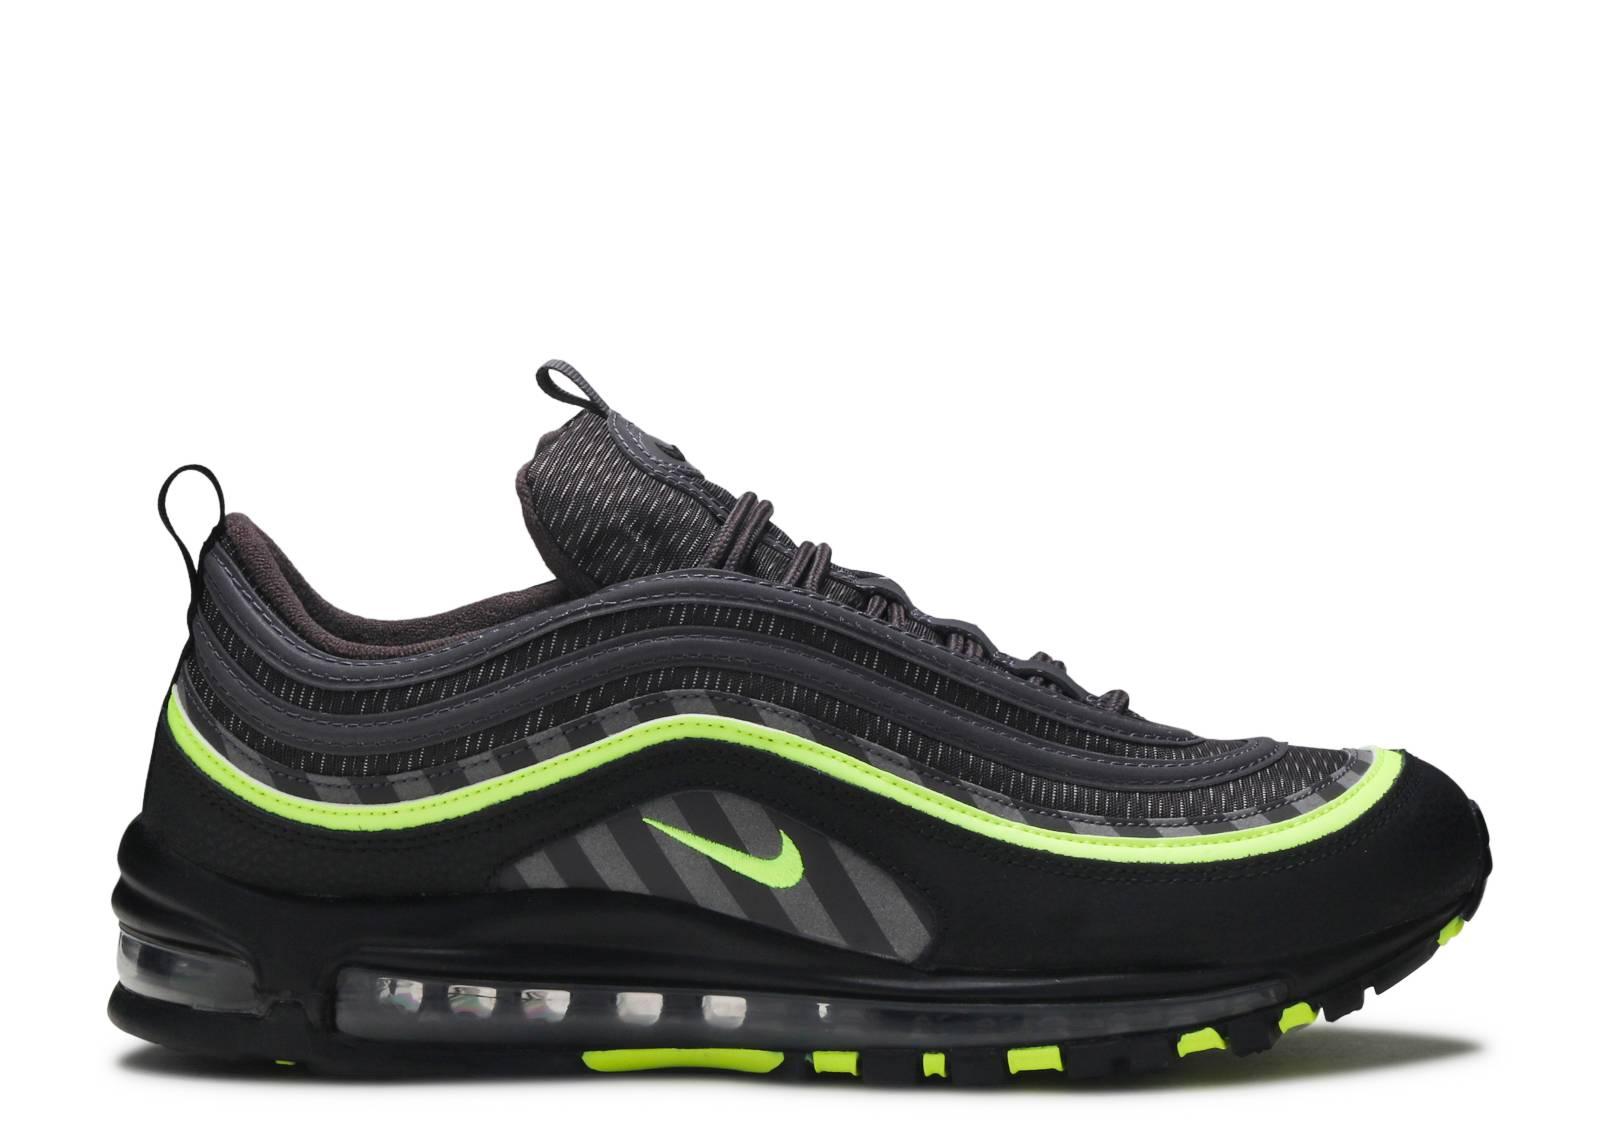 ce066c6a07 Nike Air Max 97 - Nike - bv6057 001 - thunder grey/lime blast-black ...